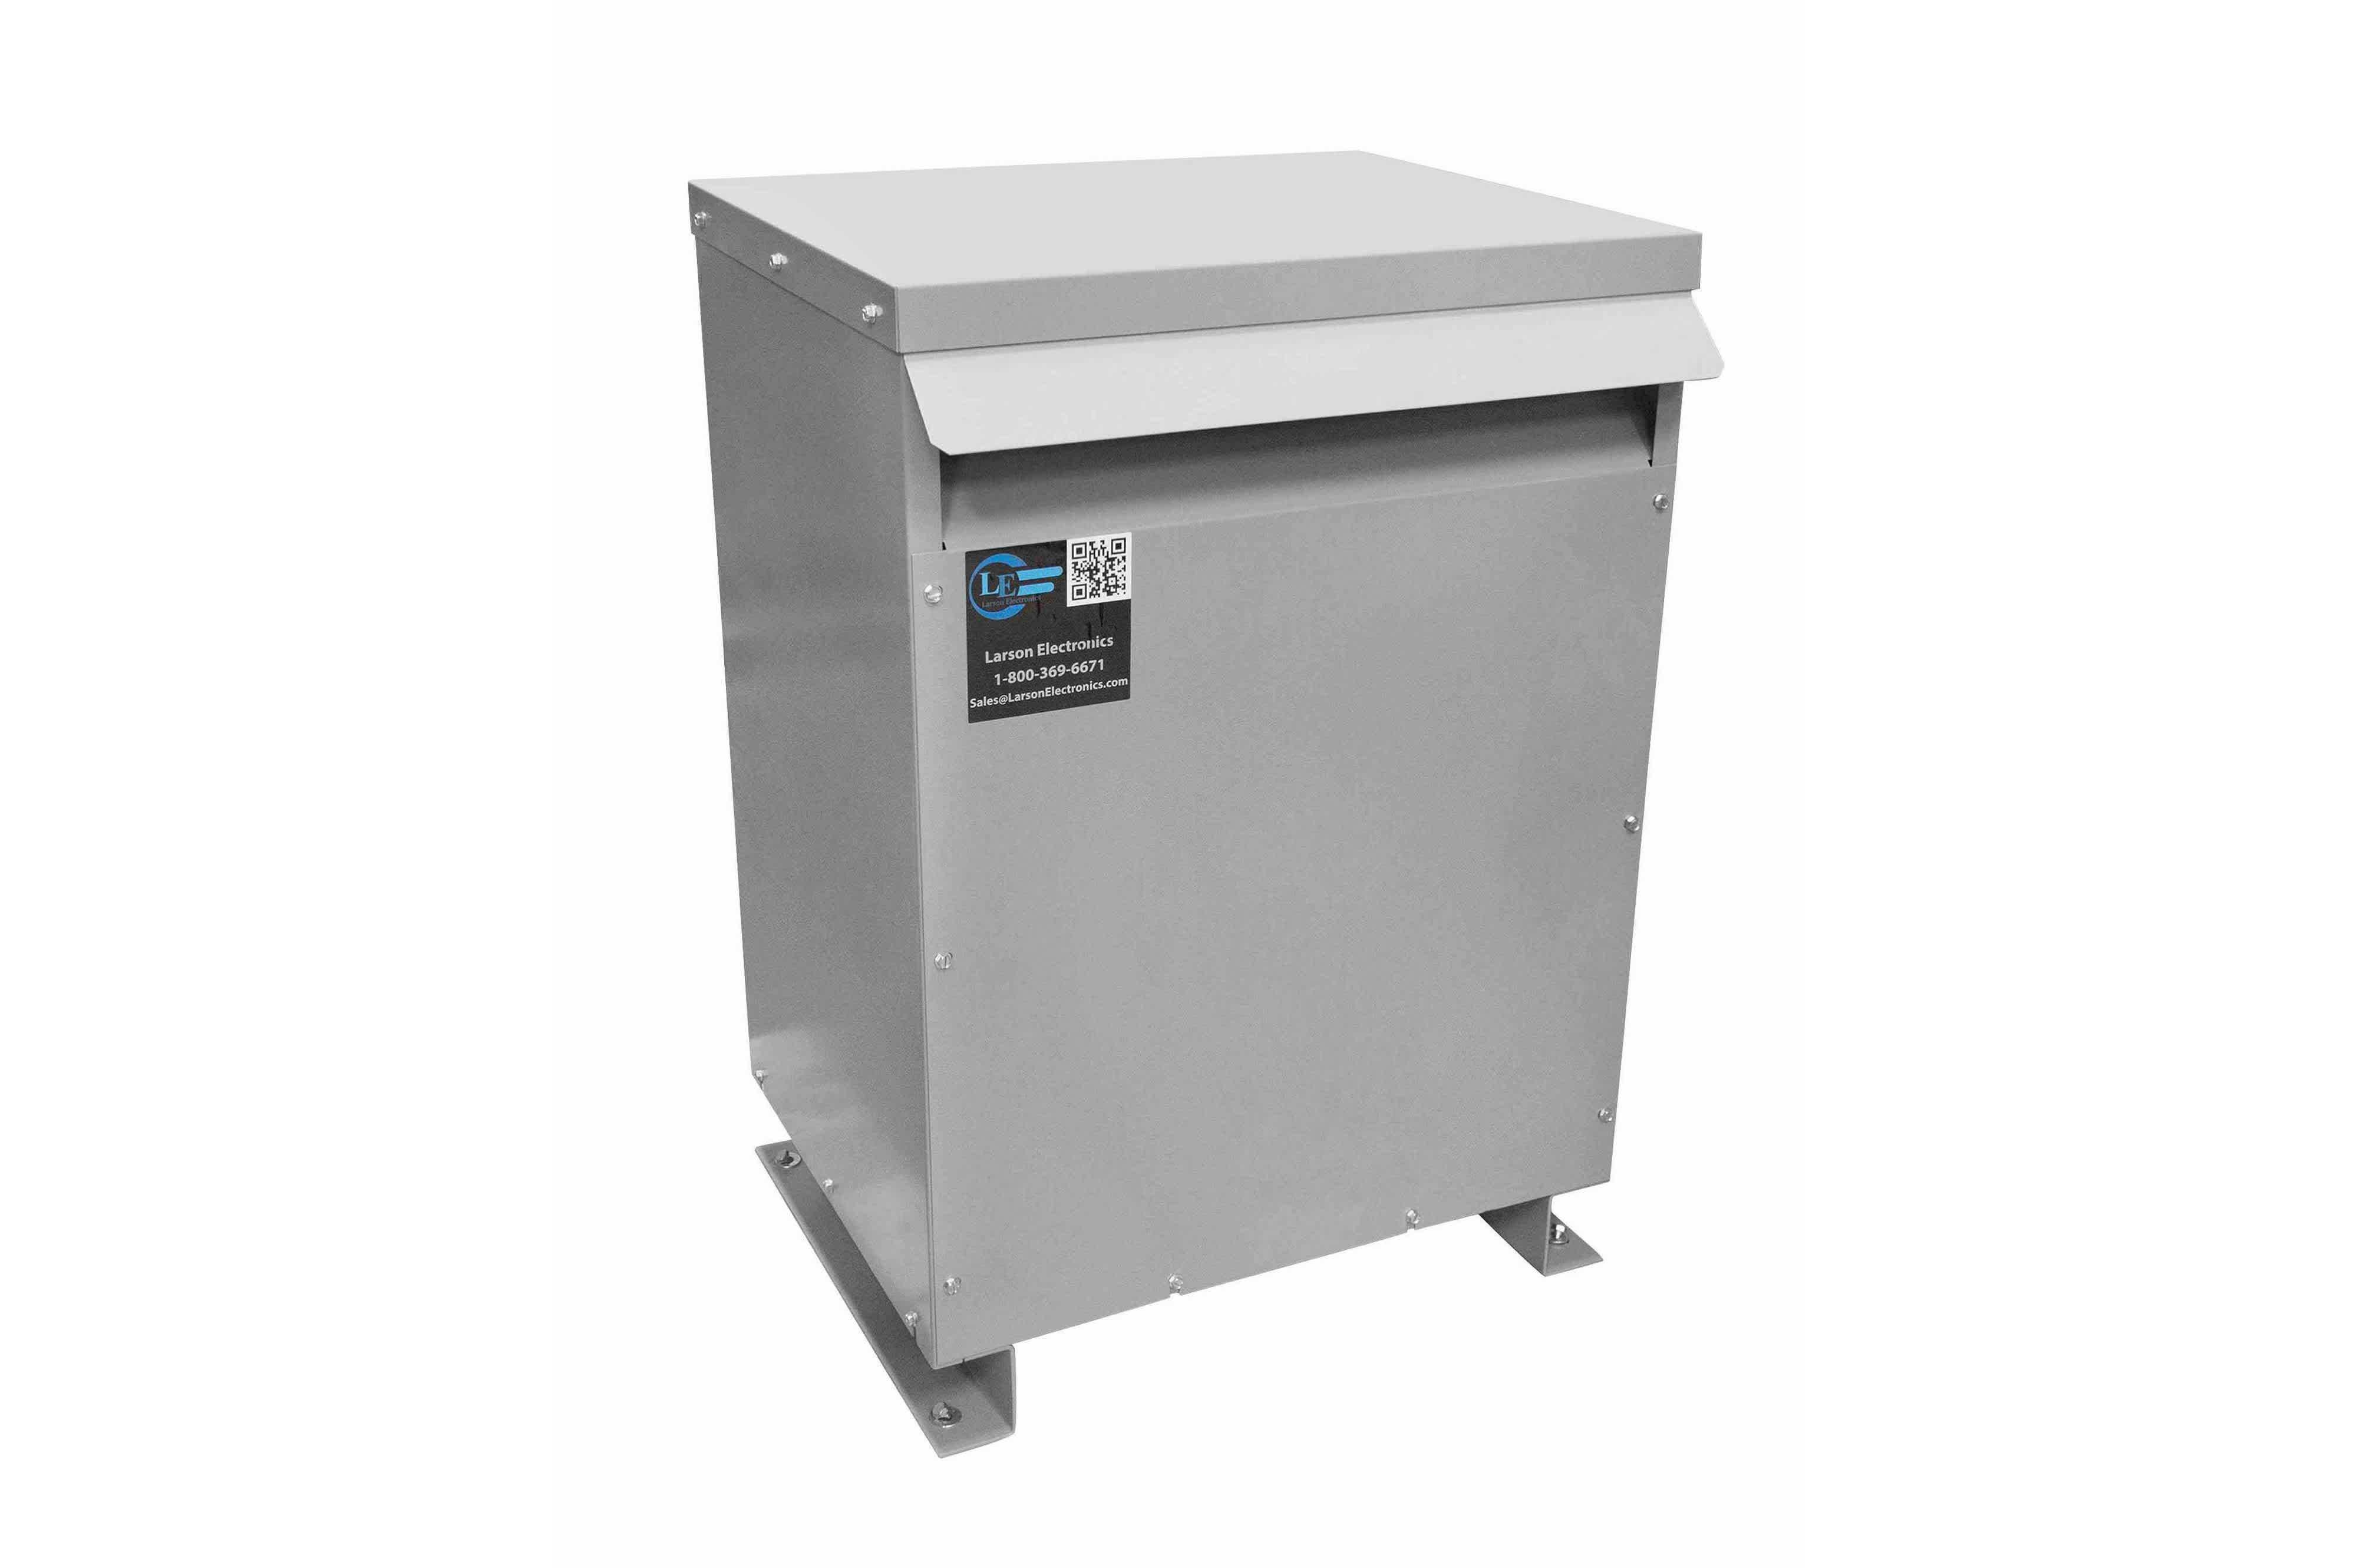 150 kVA 3PH Isolation Transformer, 600V Wye Primary, 400V Delta Secondary, N3R, Ventilated, 60 Hz